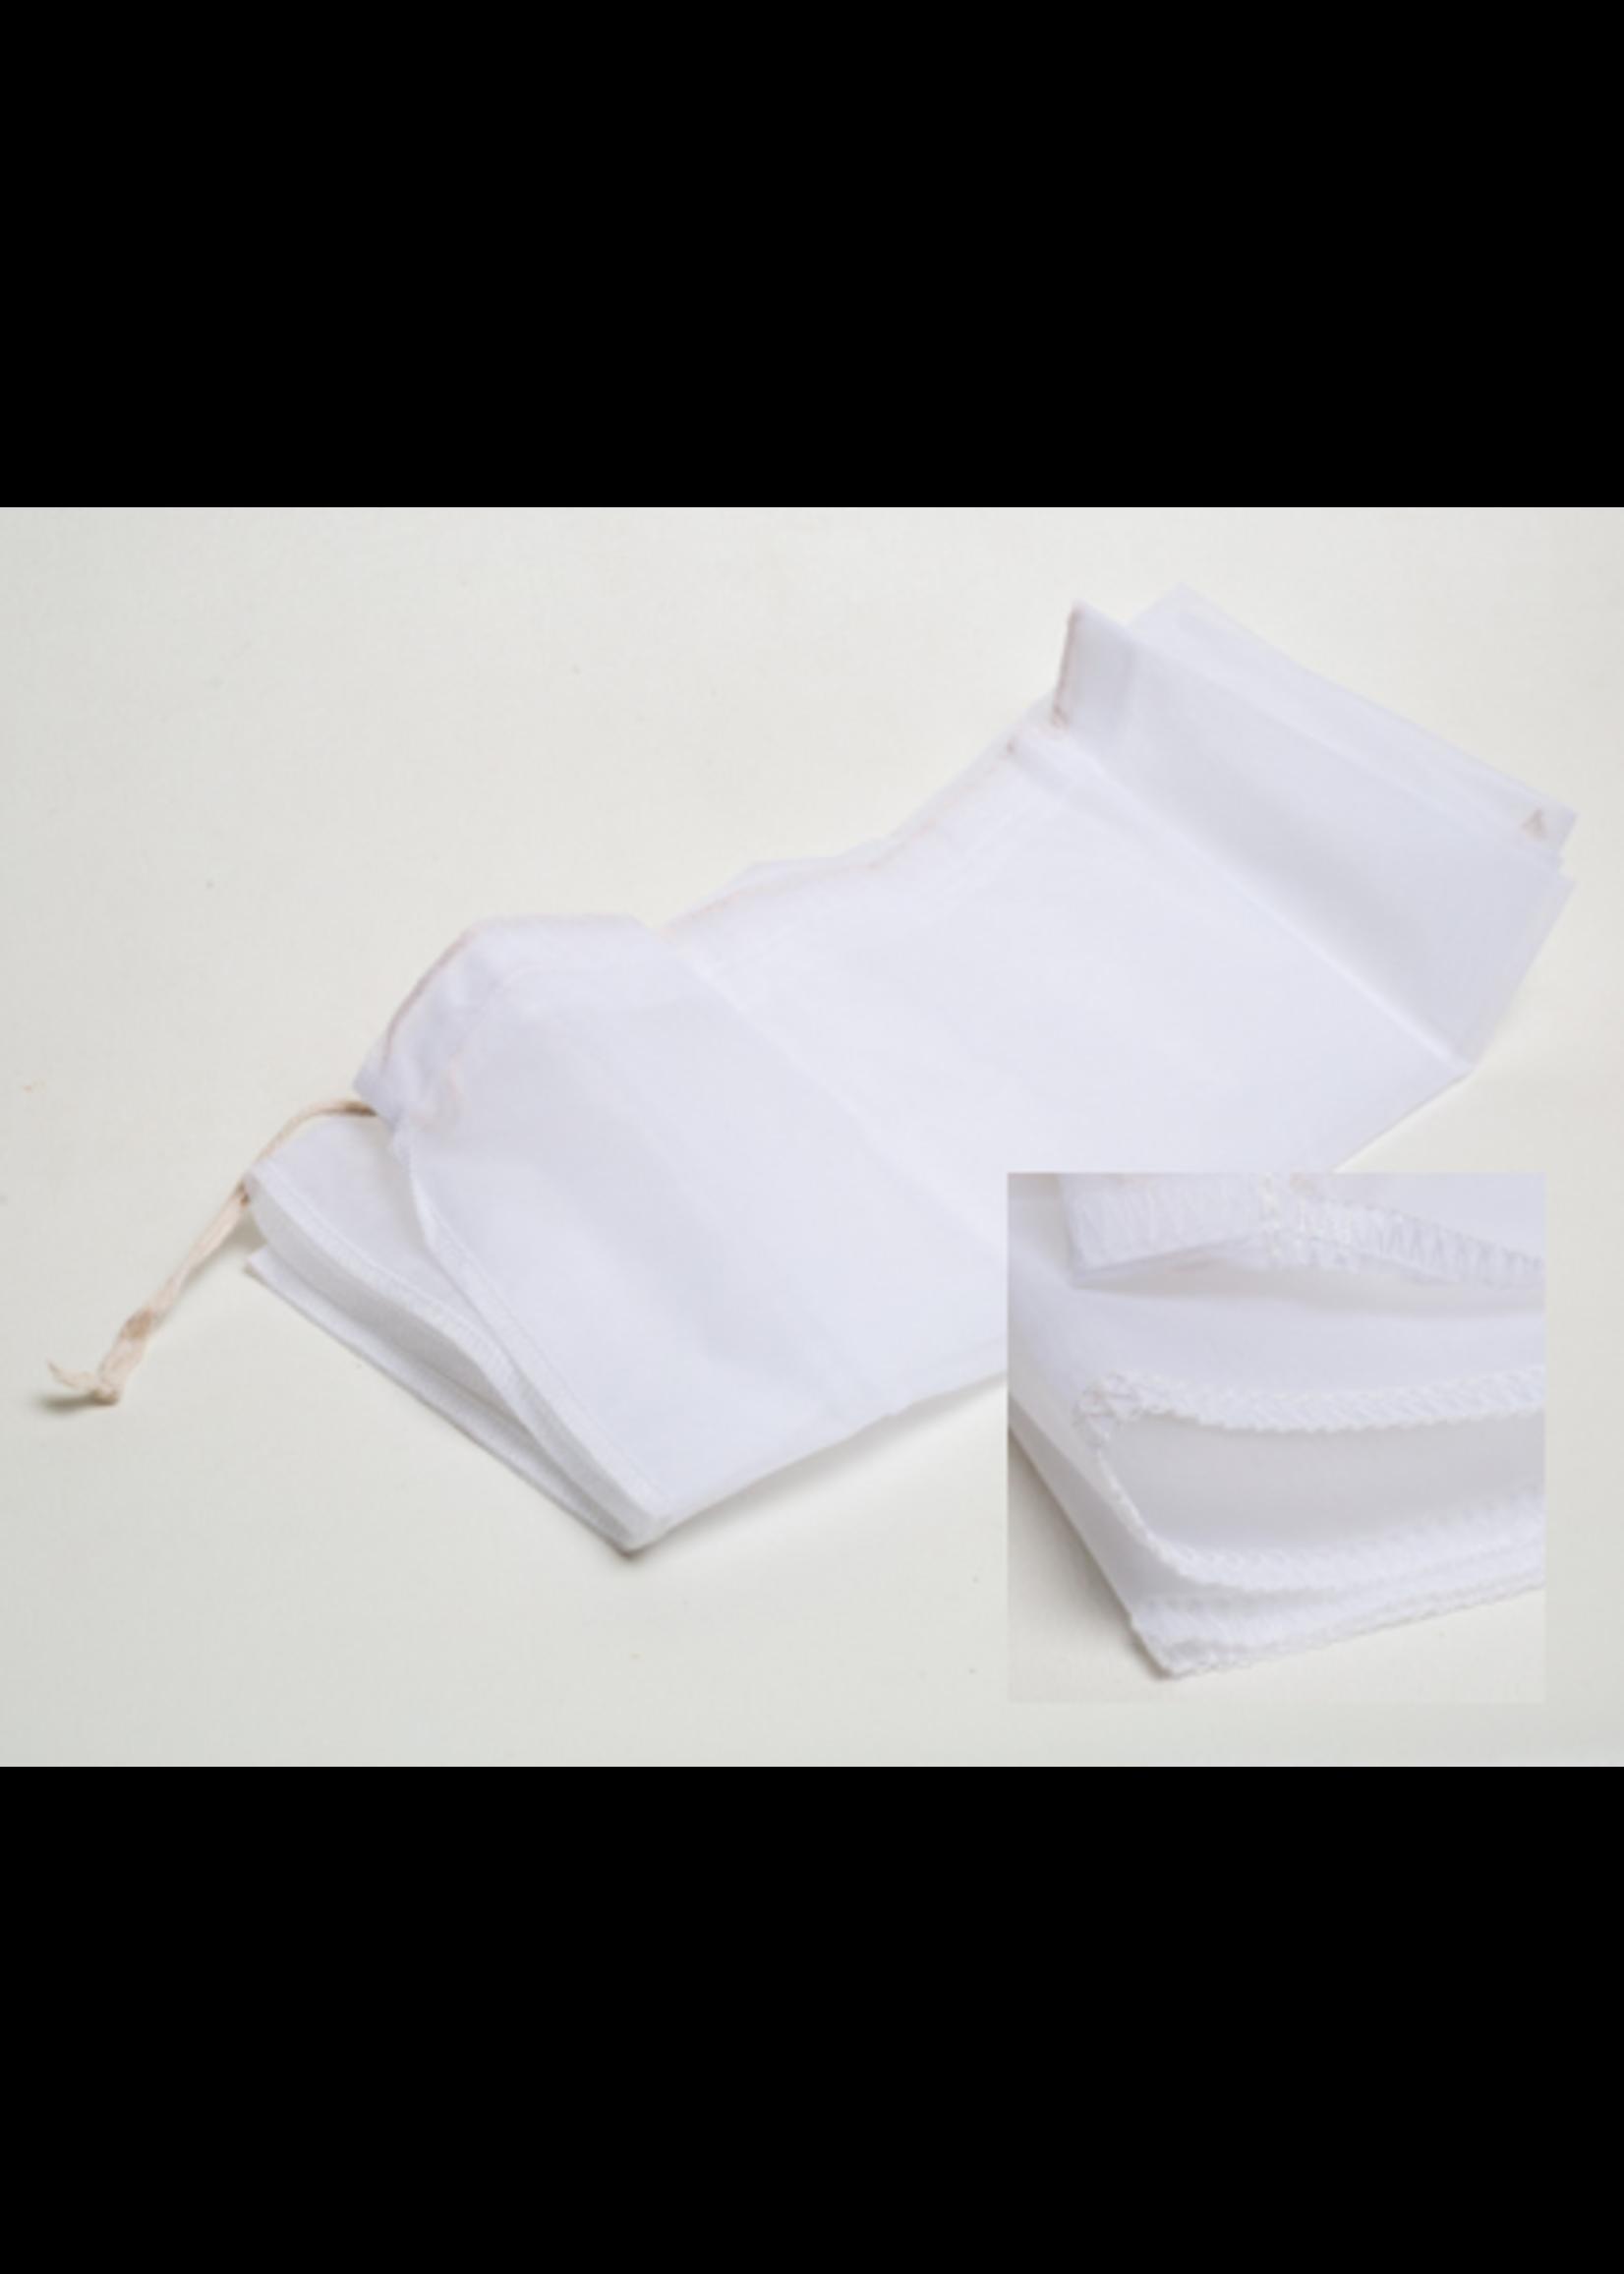 Brewing Straining Bag, Nylon - Hop Bag (1 x 3)